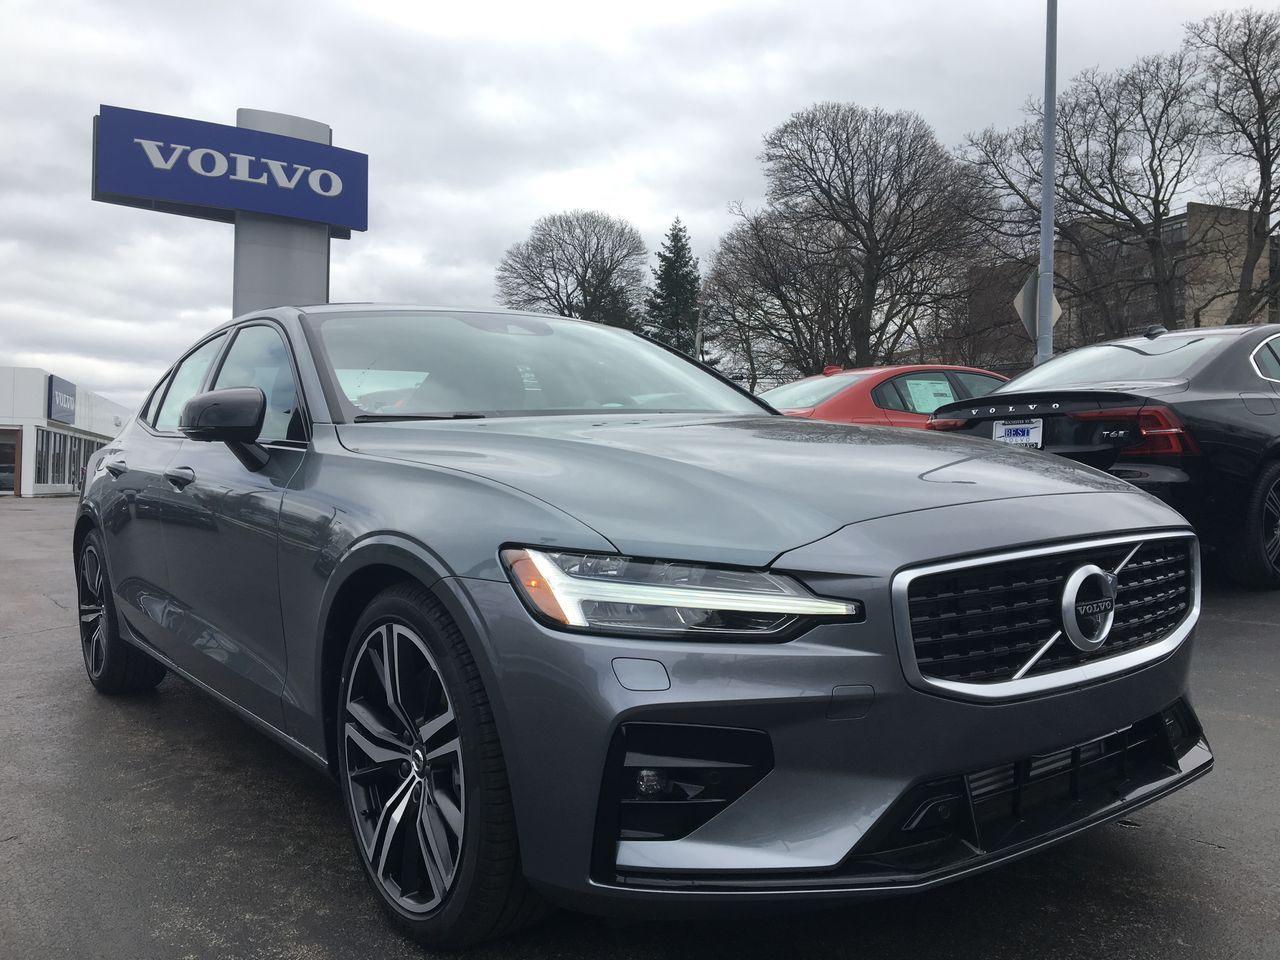 2019 Volvo S60 T6 R-Design Sedan 7JRA22TM6KG006745